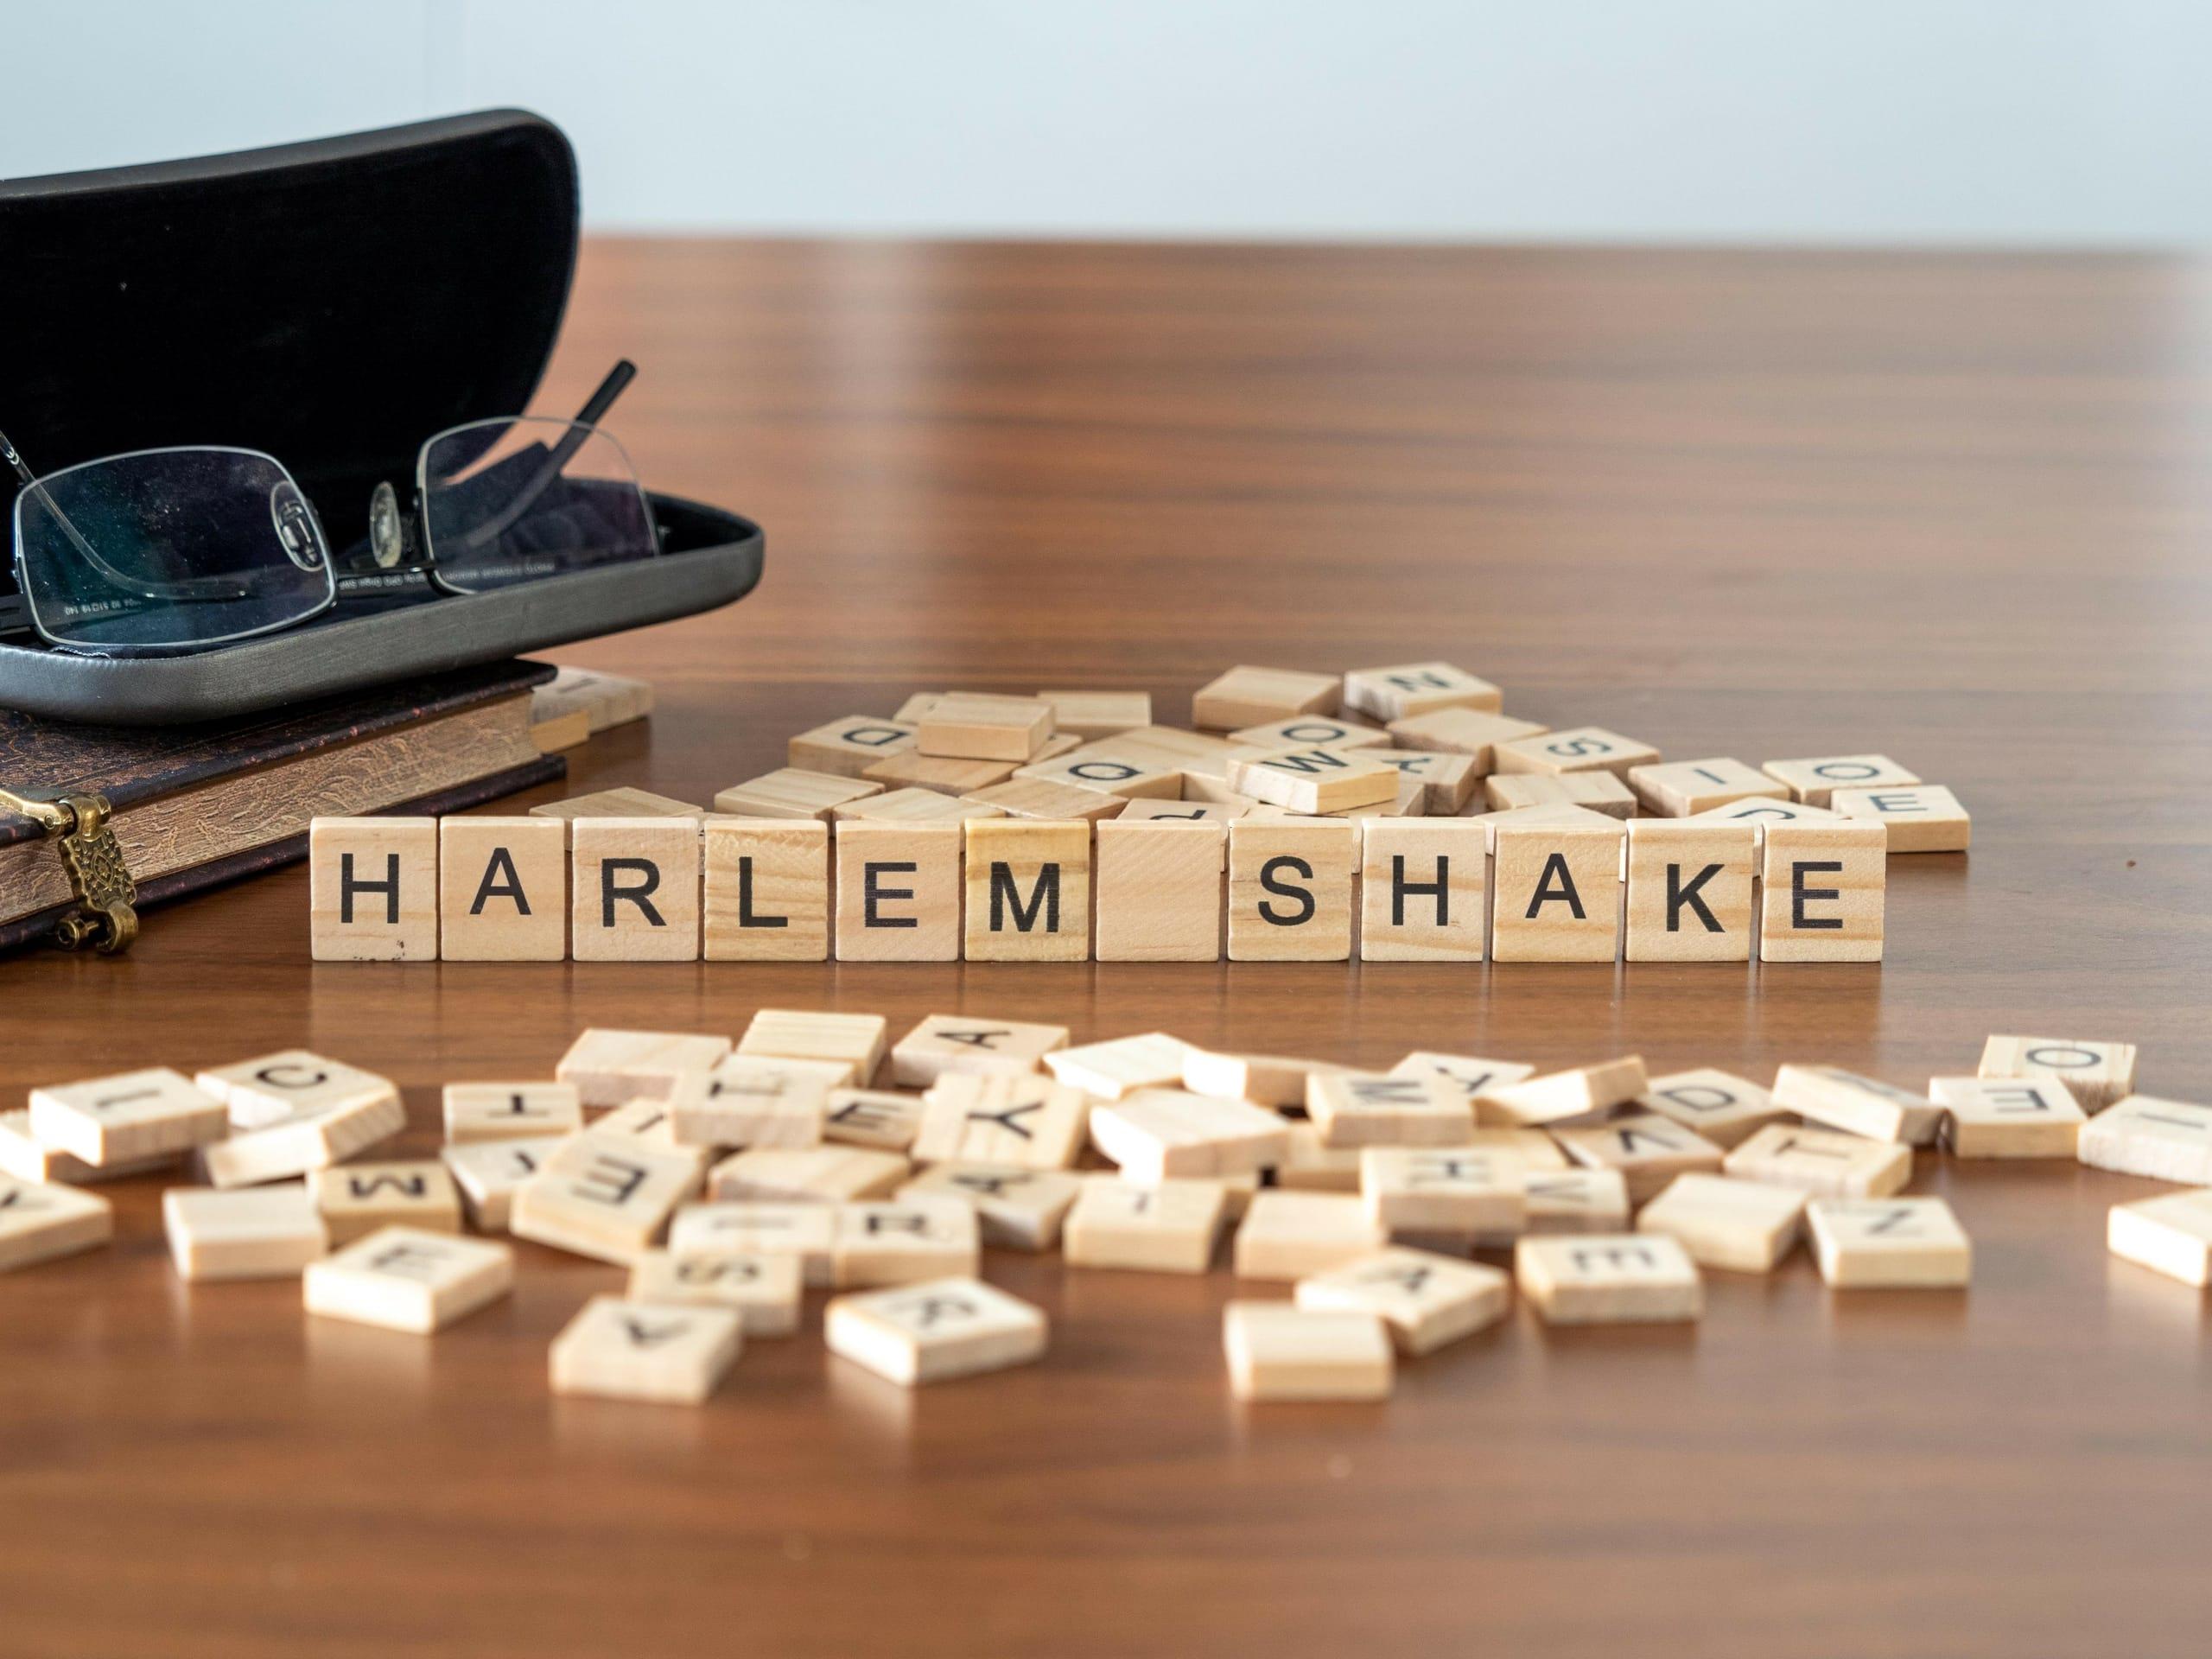 harlem shake in Scrabble-Buchstaben